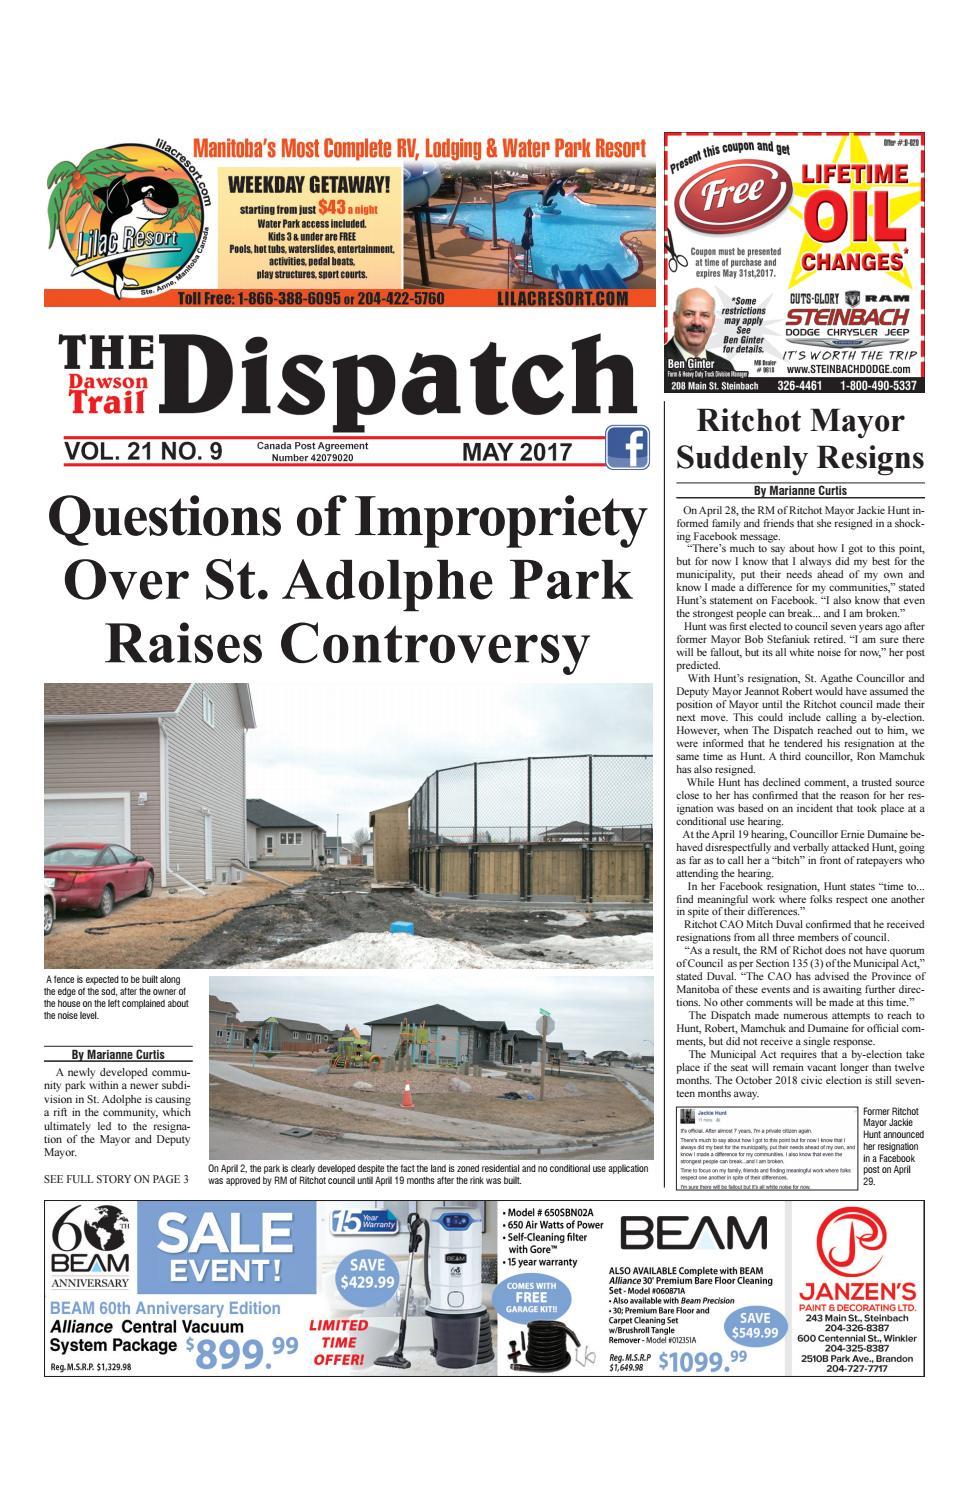 Dawson Trail Dispatch May 2017 By The